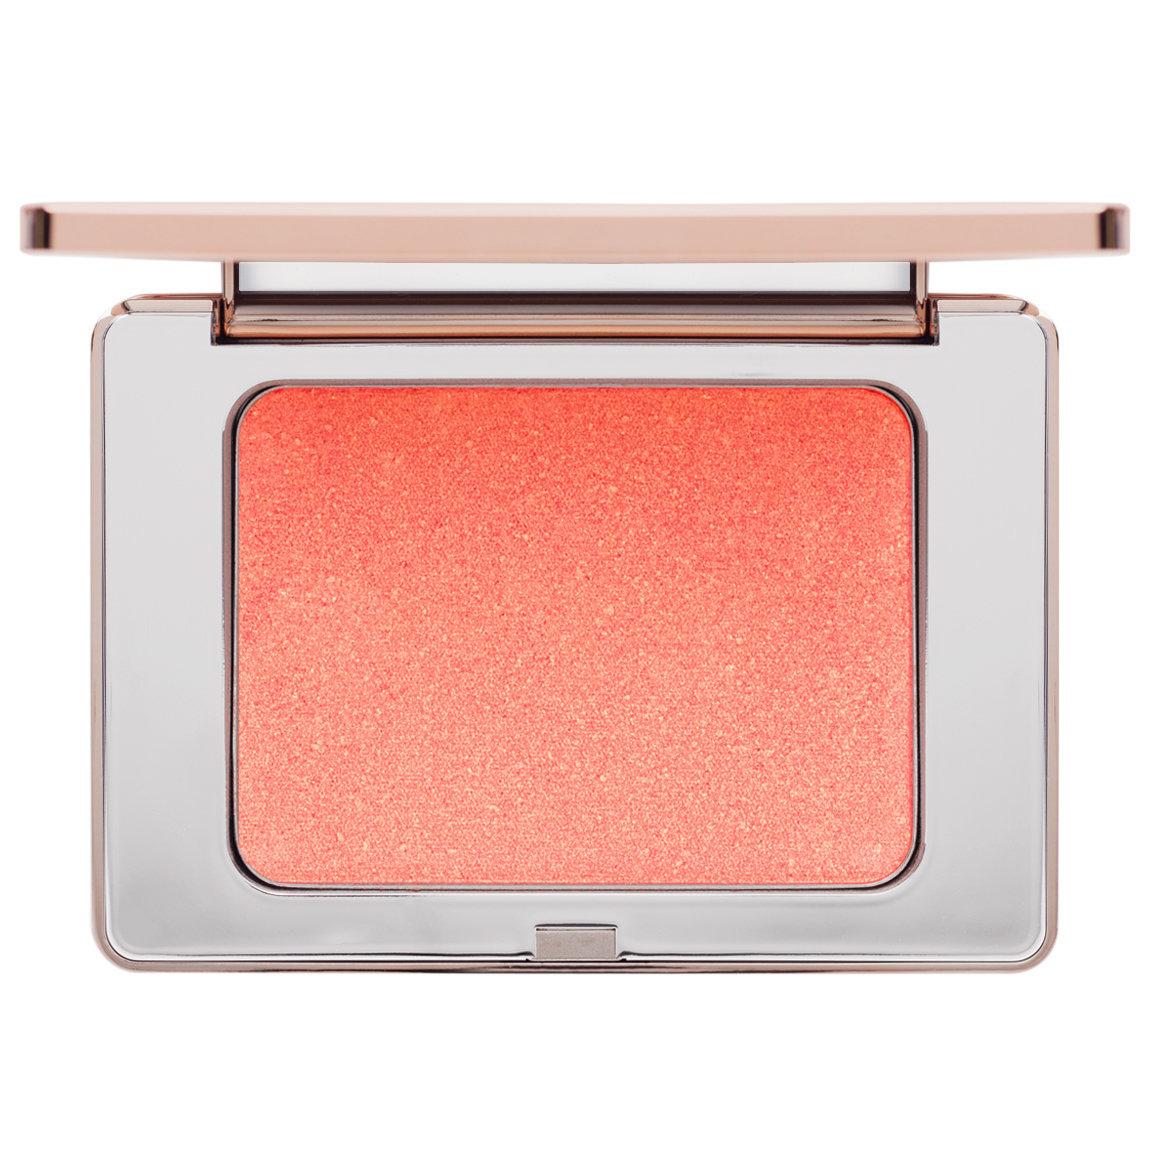 Natasha Denona Duo Glow Shimmer in Powder 01 Alba product swatch.